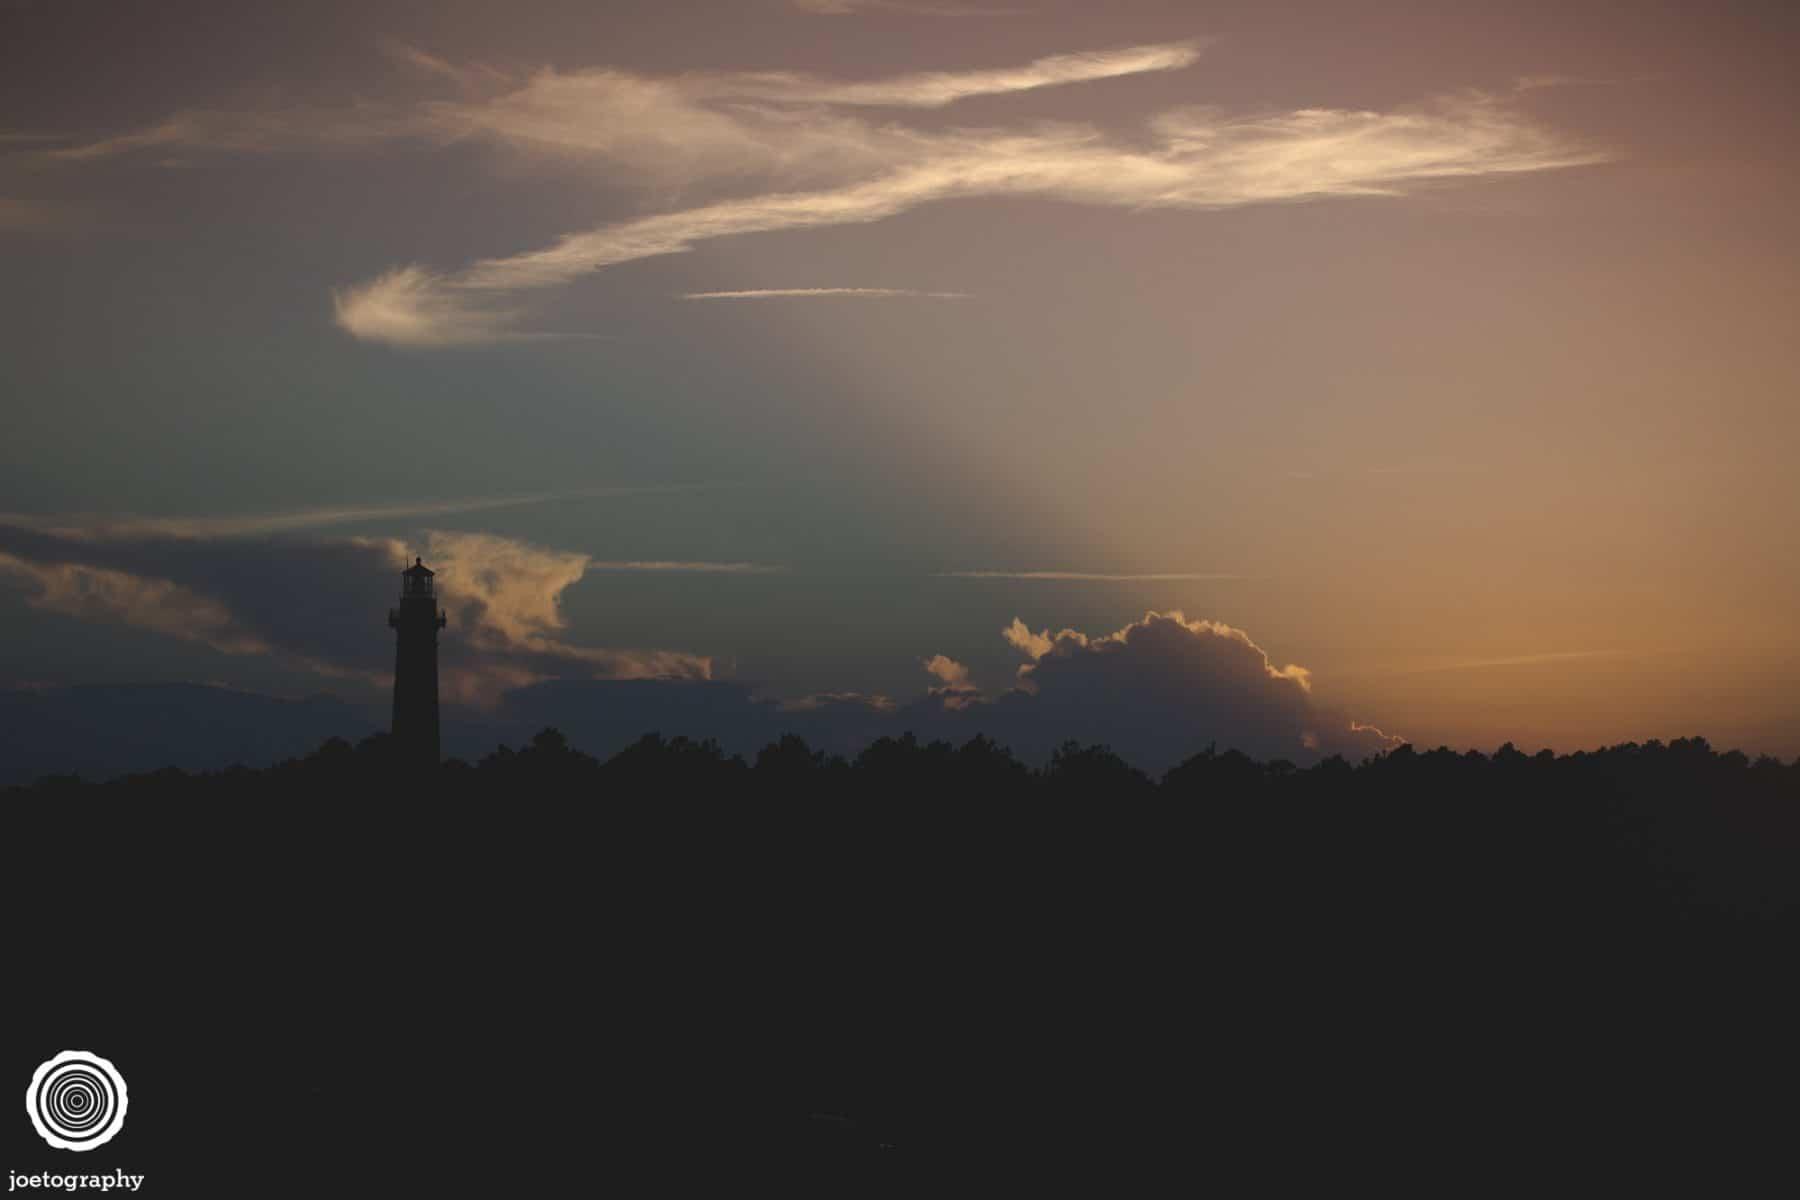 Outer-Banks-North-Carolina-Travel-Photography-1